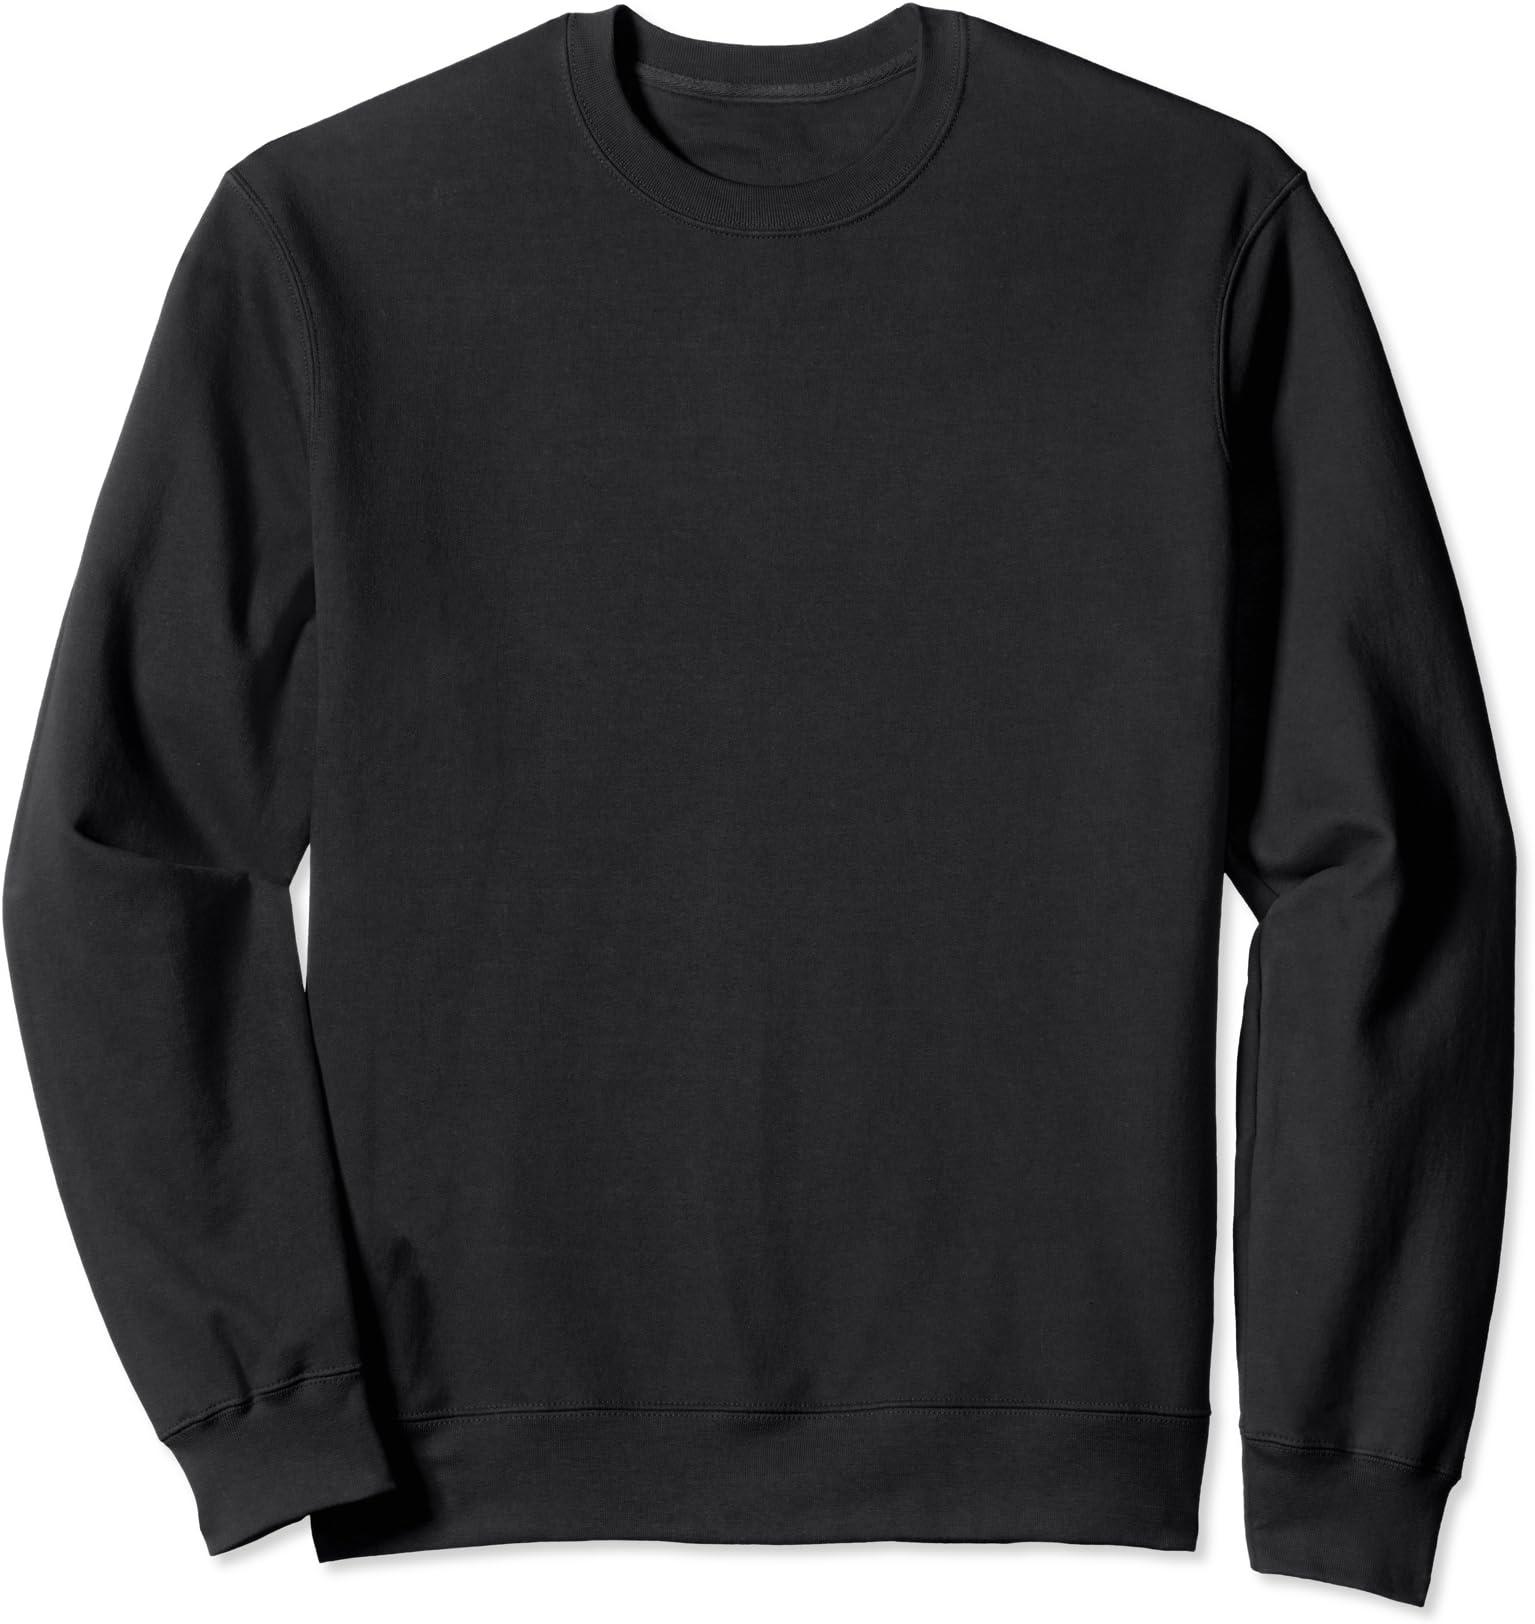 Go-d Loves Me He Made Flag Bless Faith Fashion Swaeatershirt Mens Hoodie Sweater XL Black